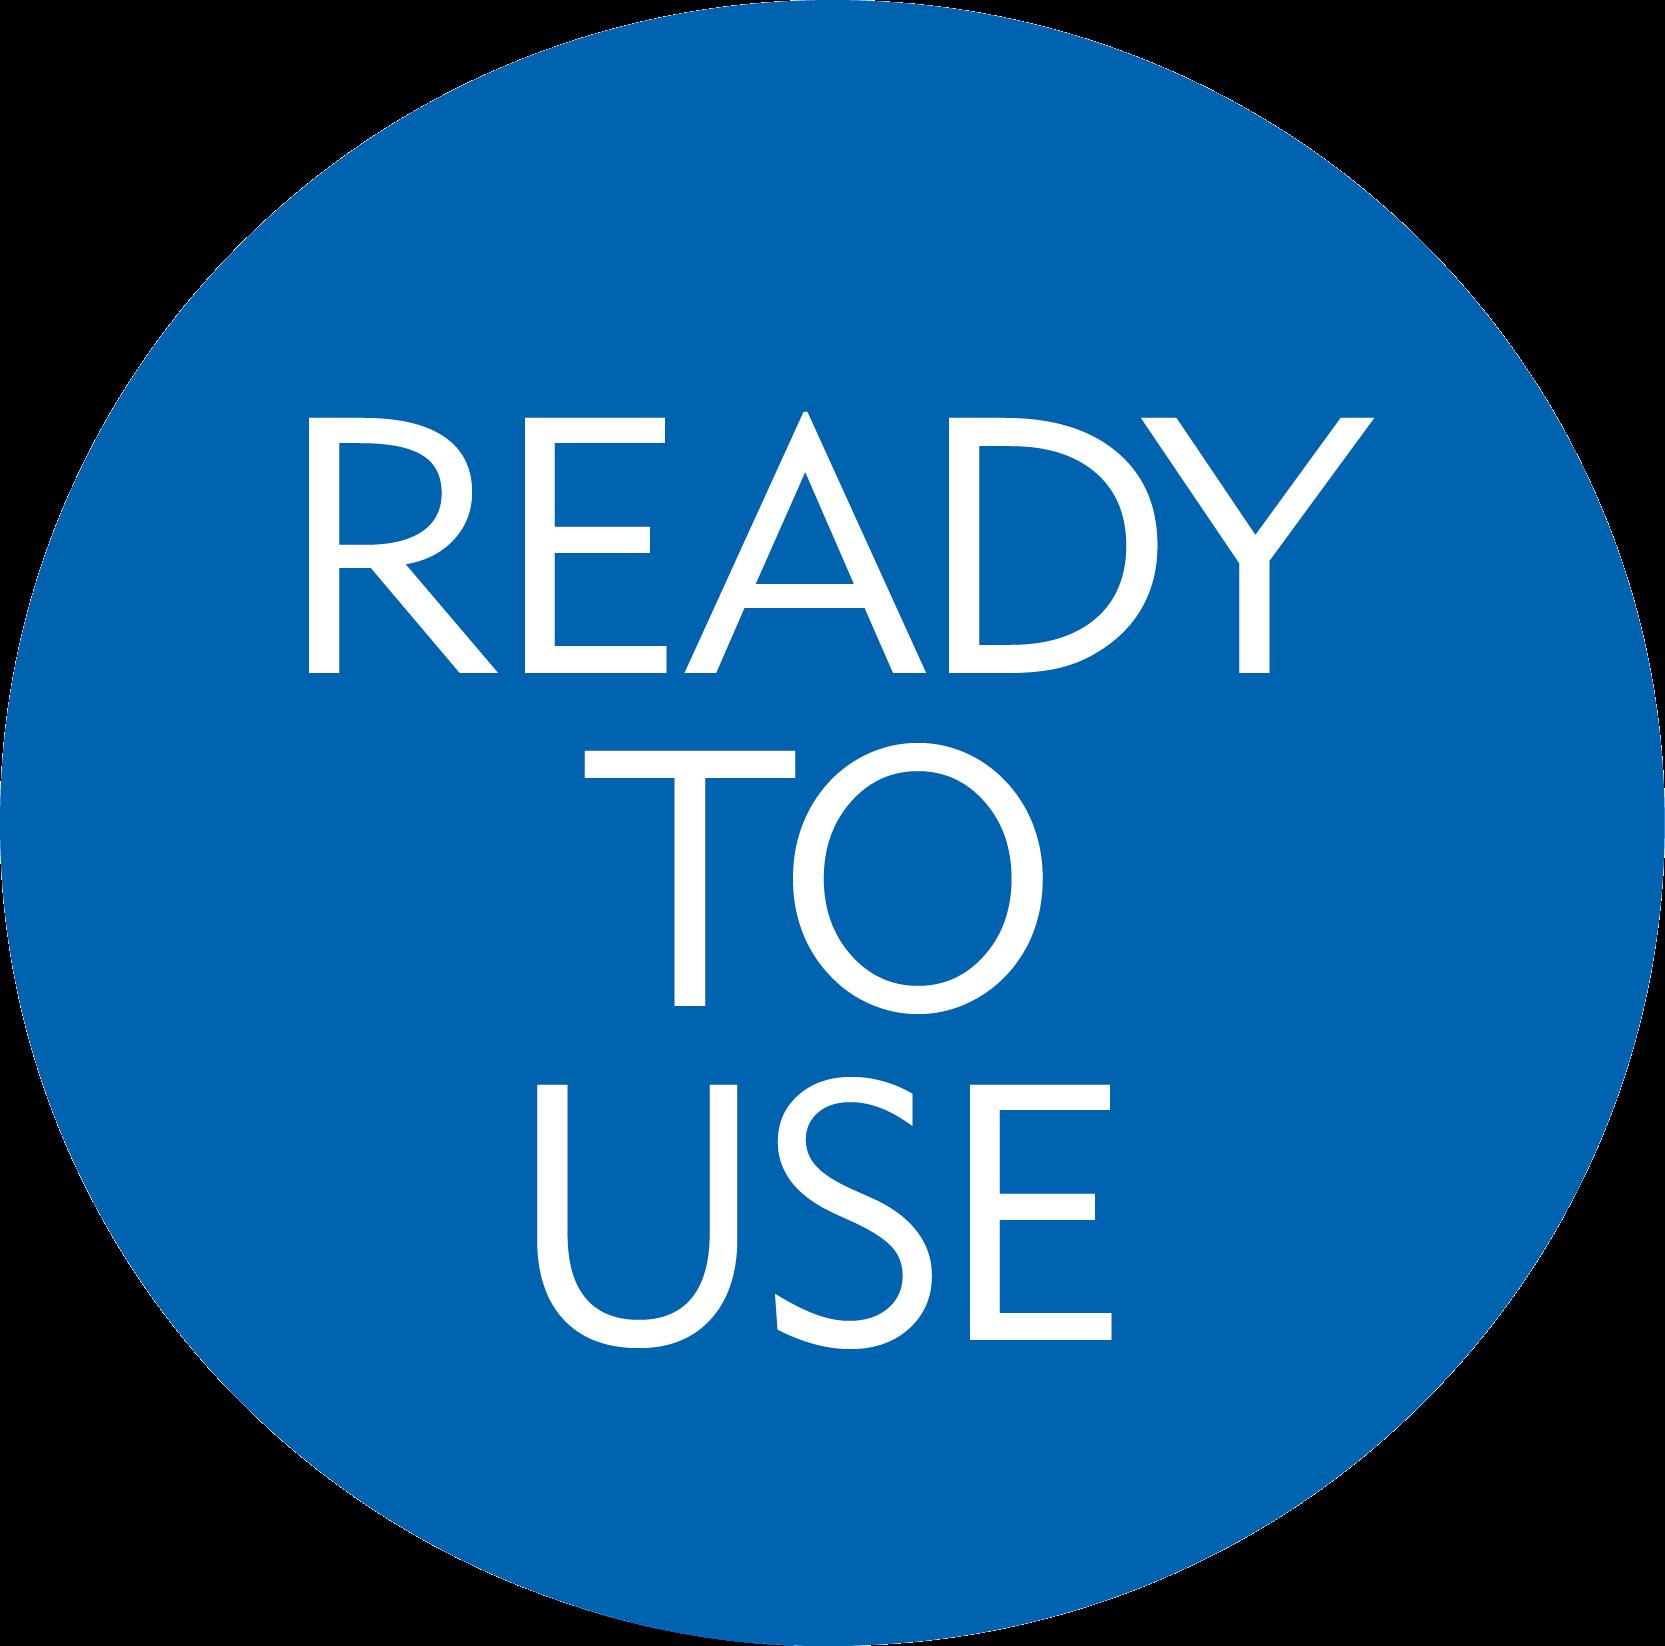 ready to use